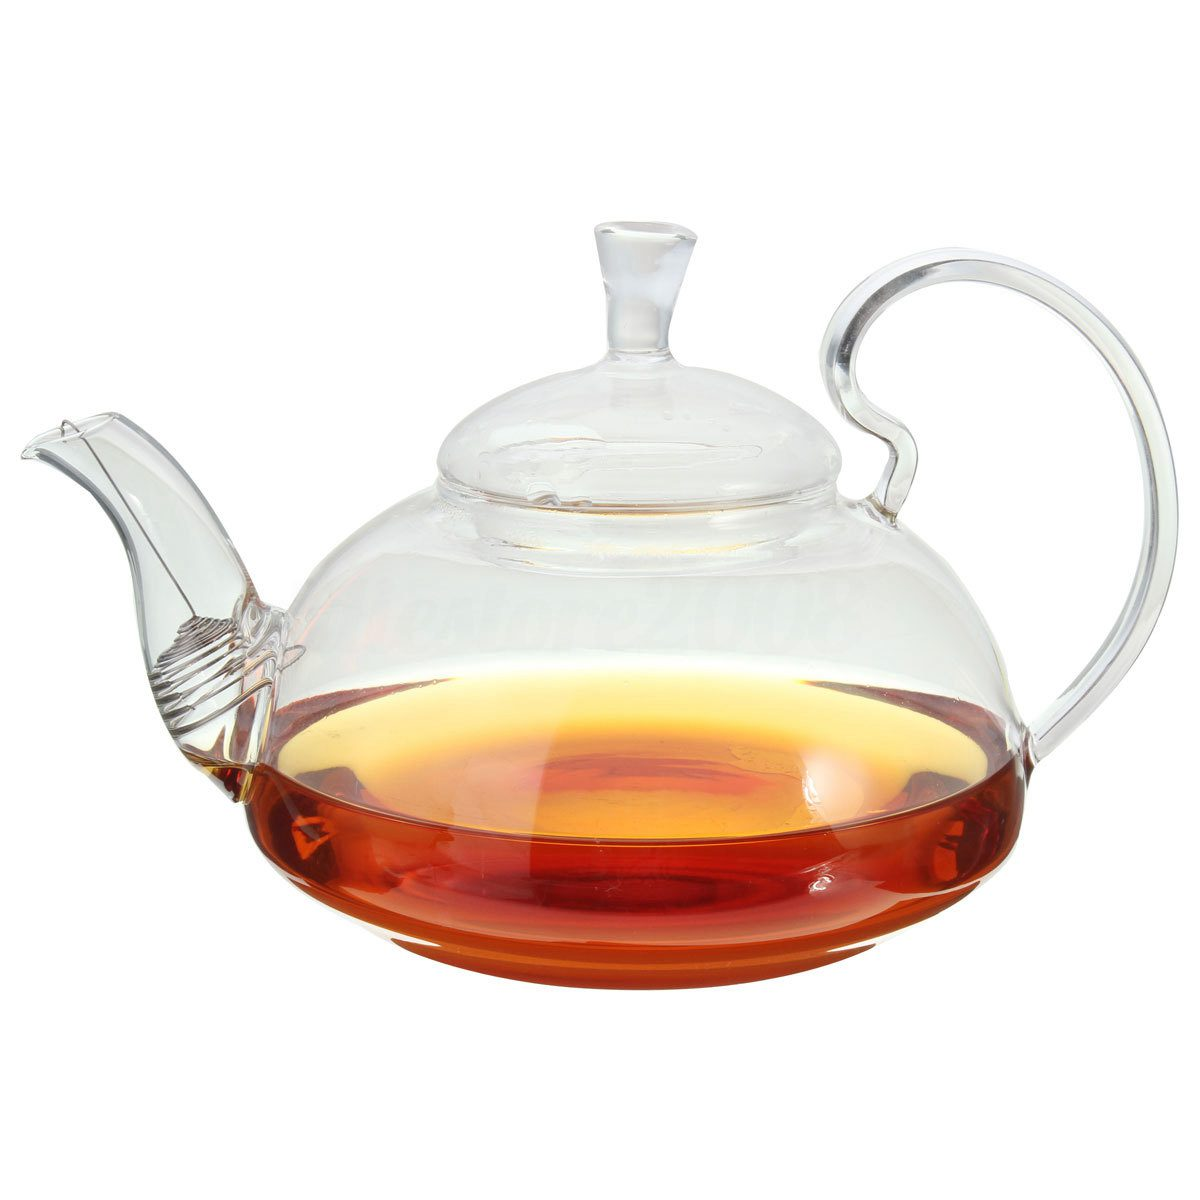 HOME-800ml Clear Glass Heat Resistant Teapot / Infuser Flower / Green Leaf Tea PotsHOME-800ml Clear Glass Heat Resistant Teapot / Infuser Flower / Green Leaf Tea Pots